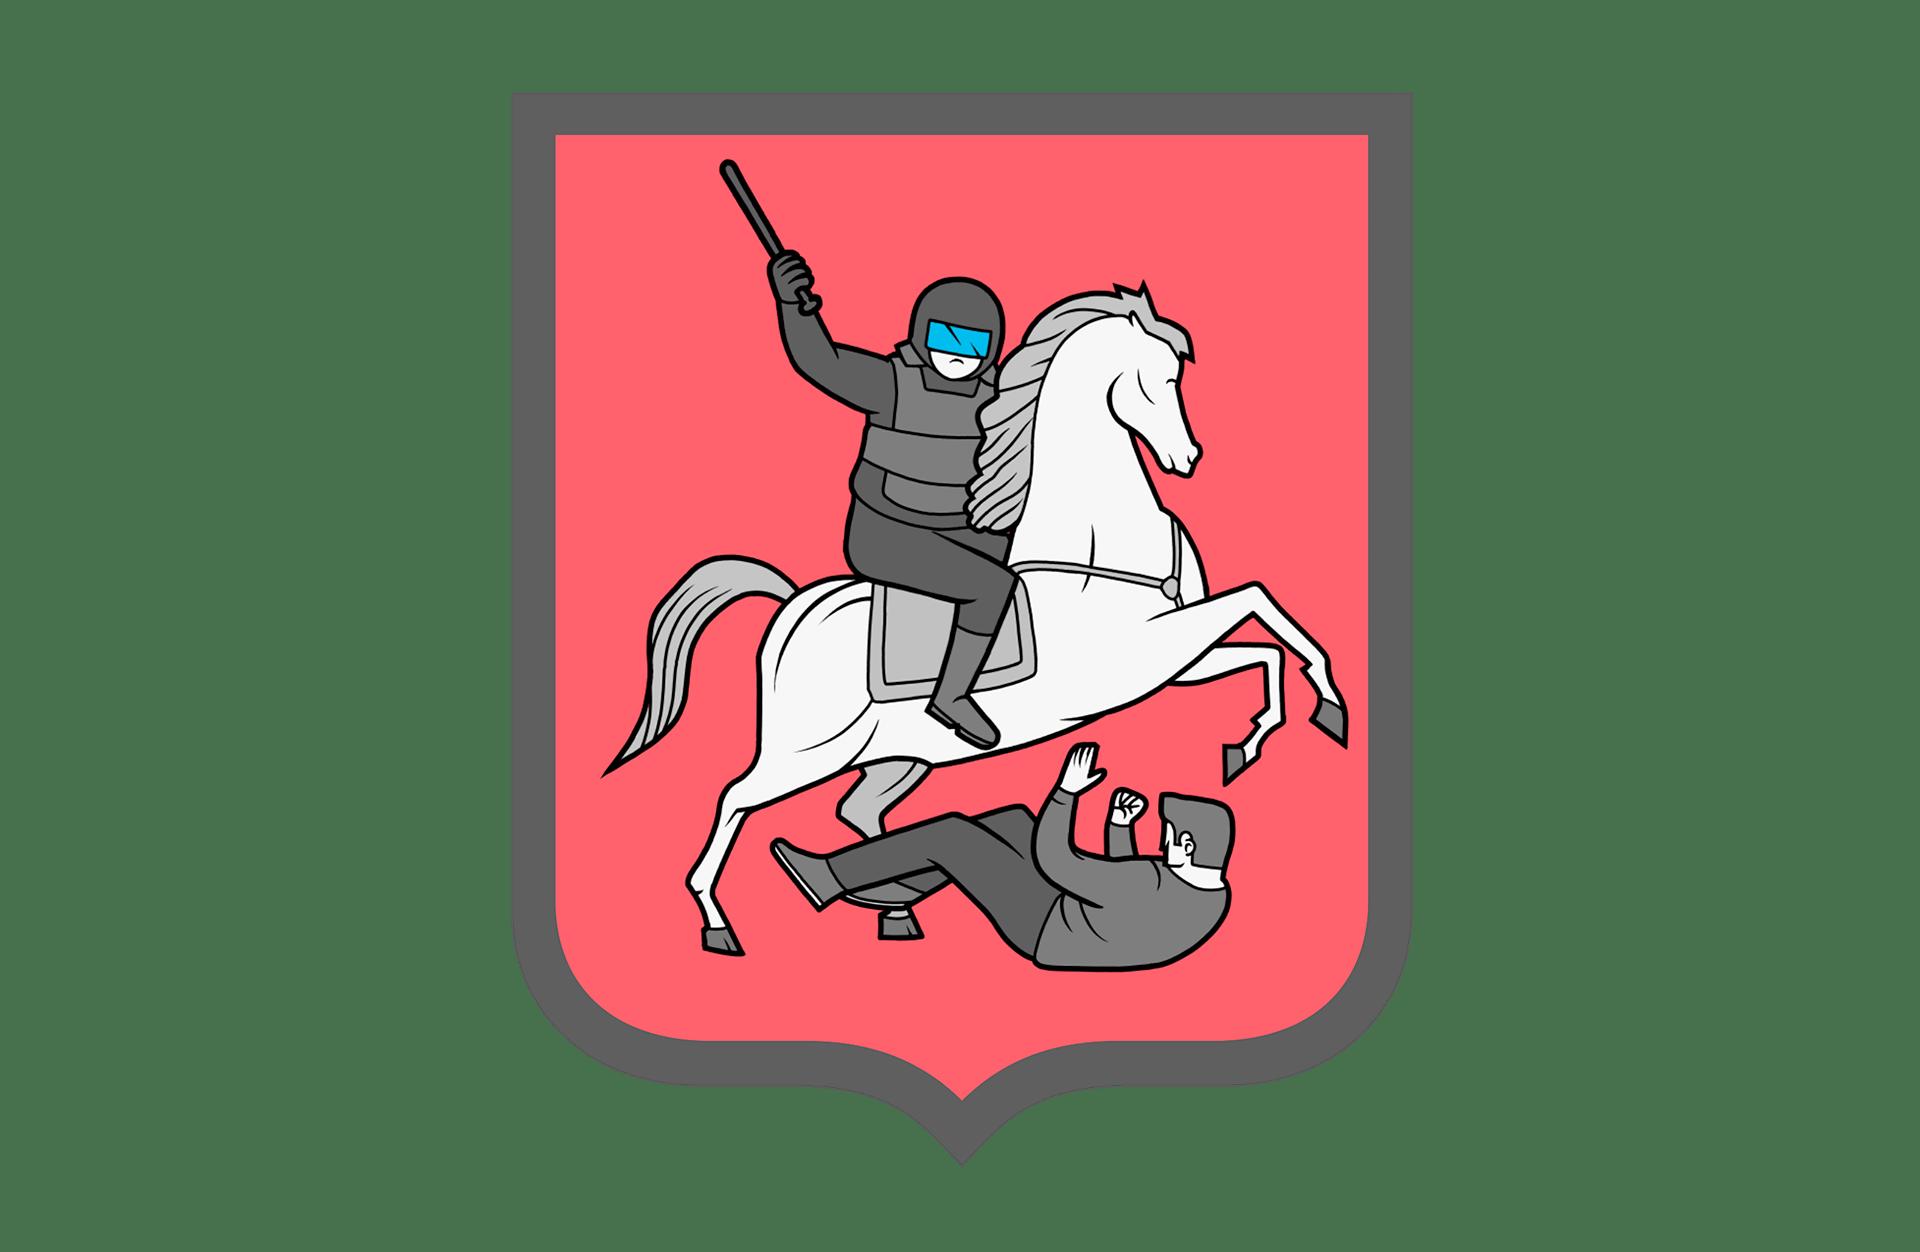 02 - Новый герб Москвы